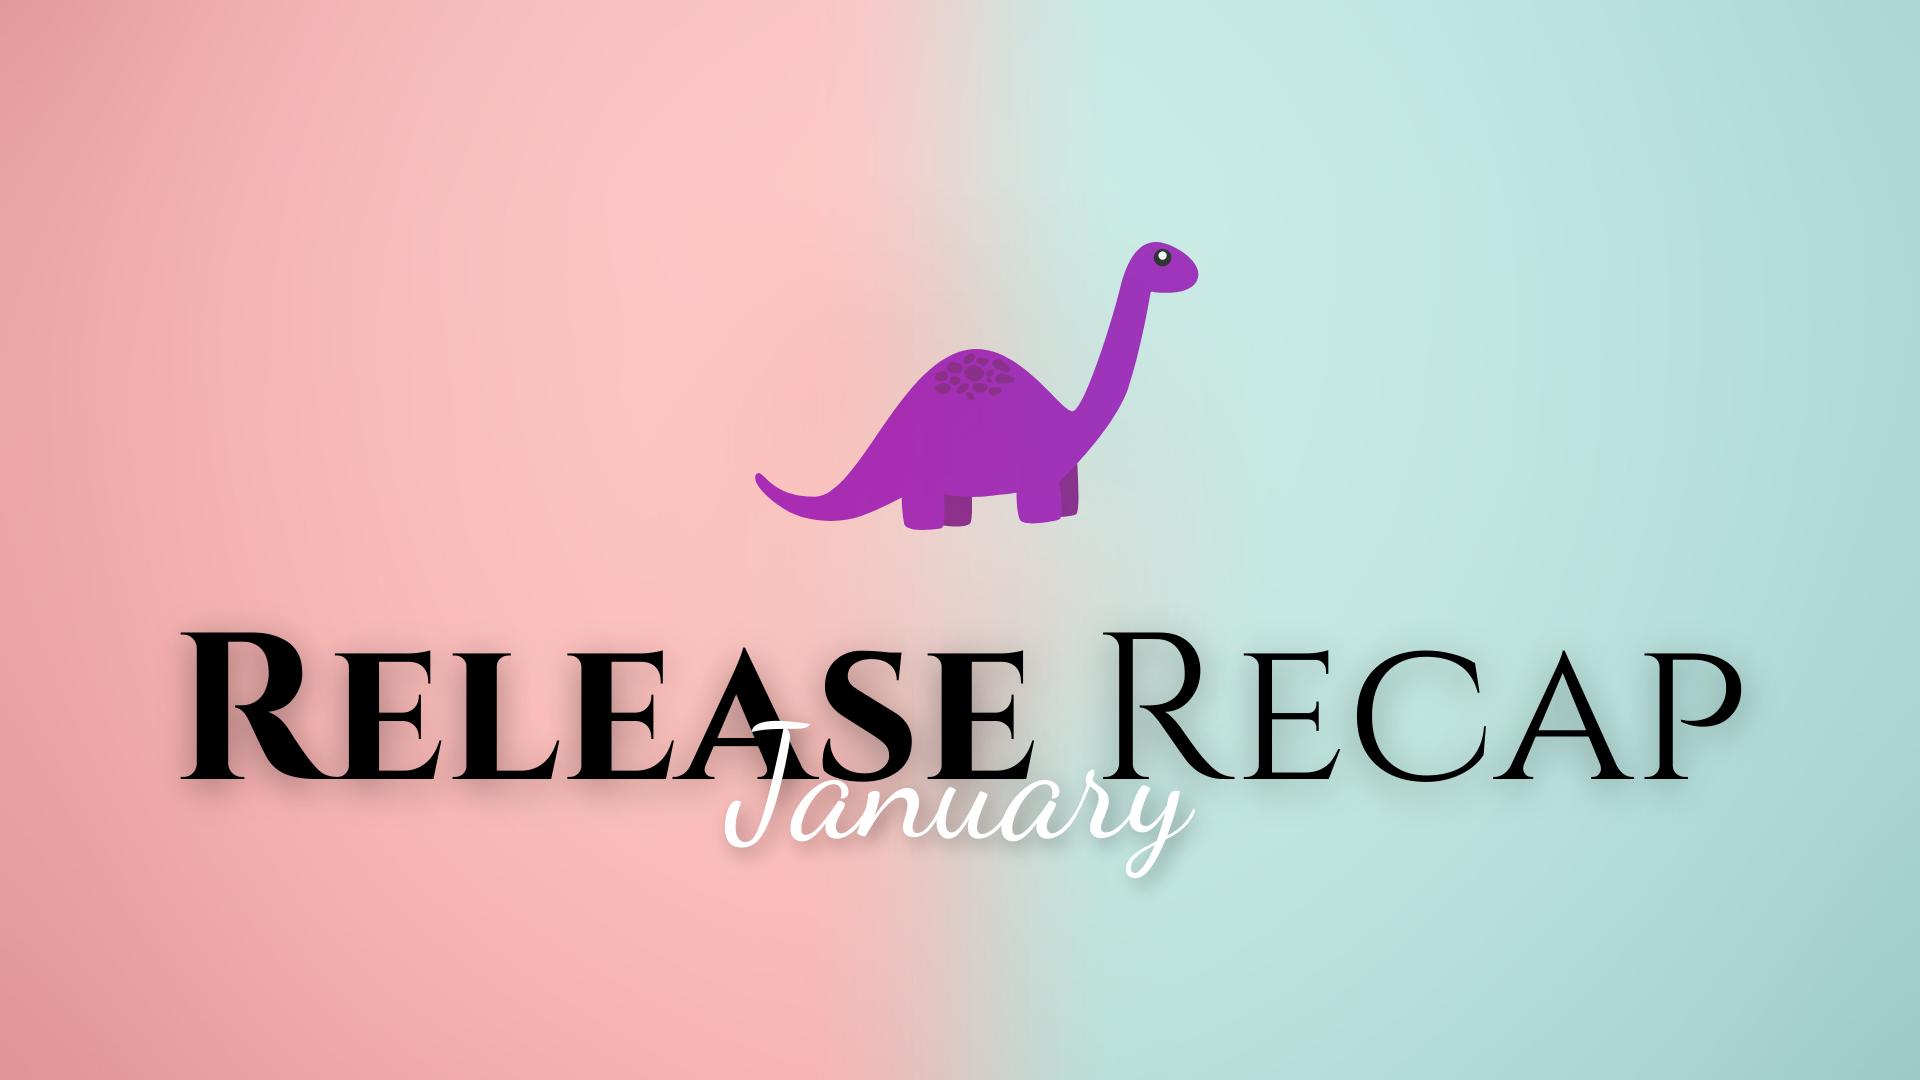 January Release Recap